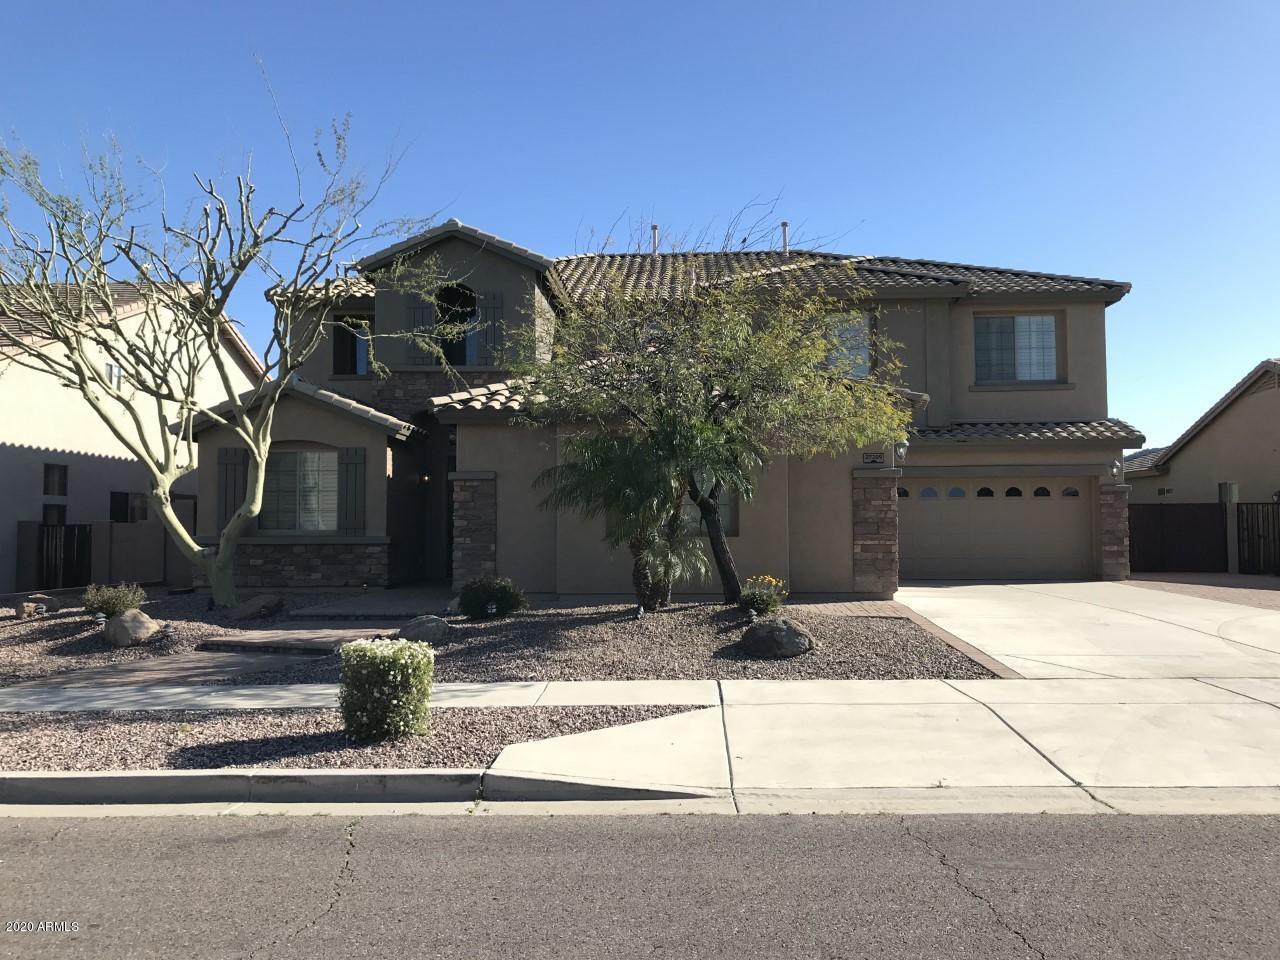 Photo of 27209 N Gidiyup Trail, Phoenix, AZ 85085